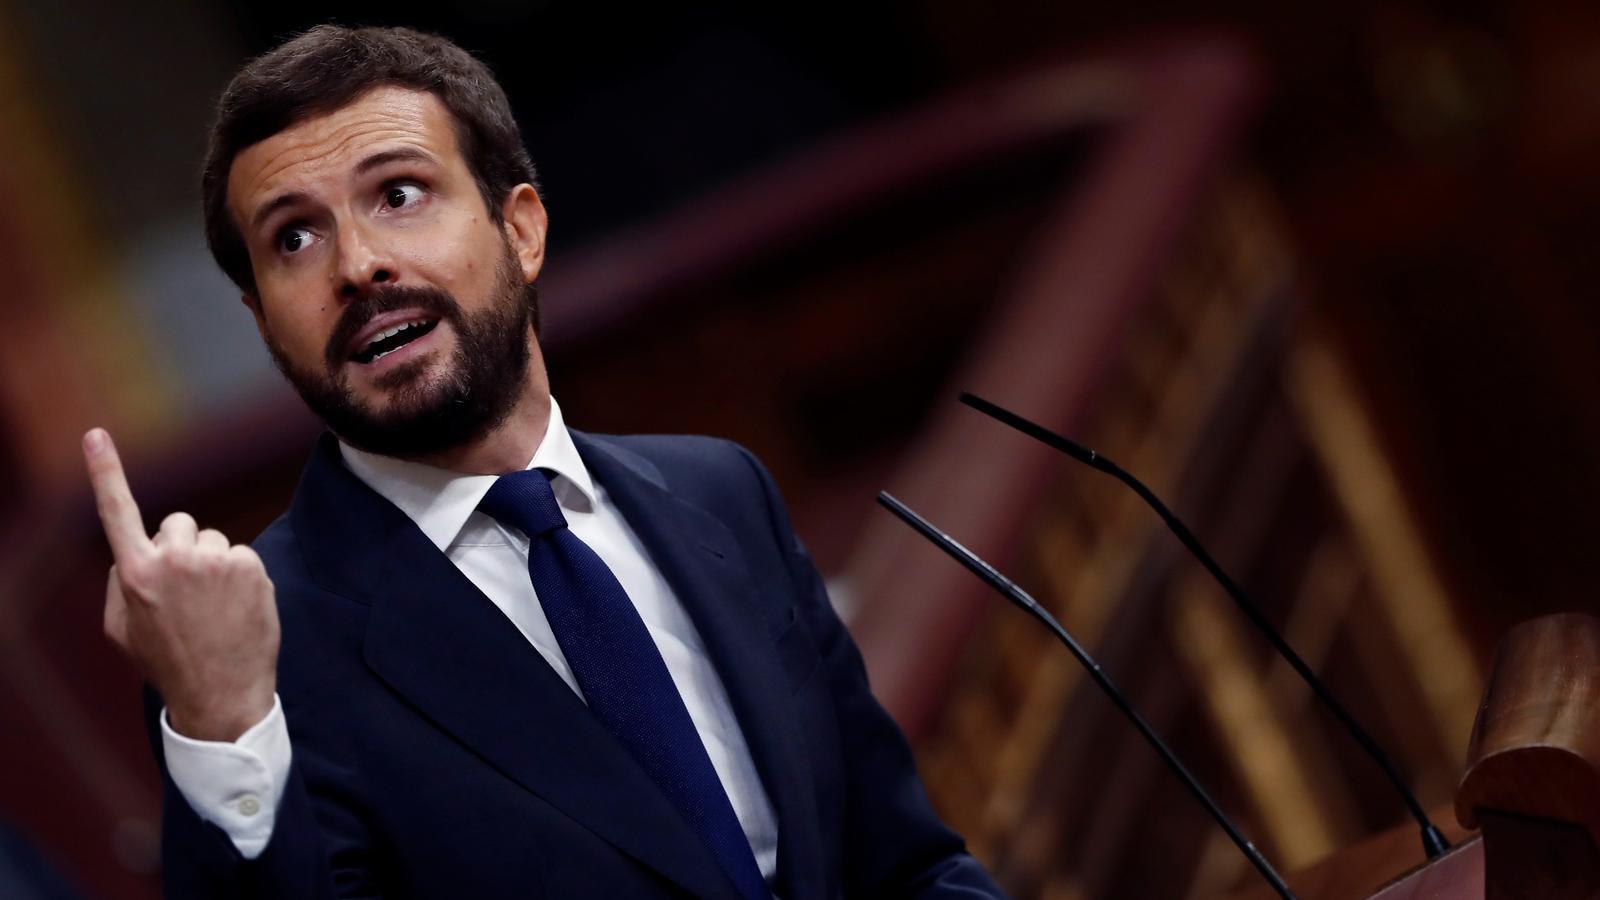 El líder del PP, Pablo Casado, durant el debat de la moció de censura de Vox.